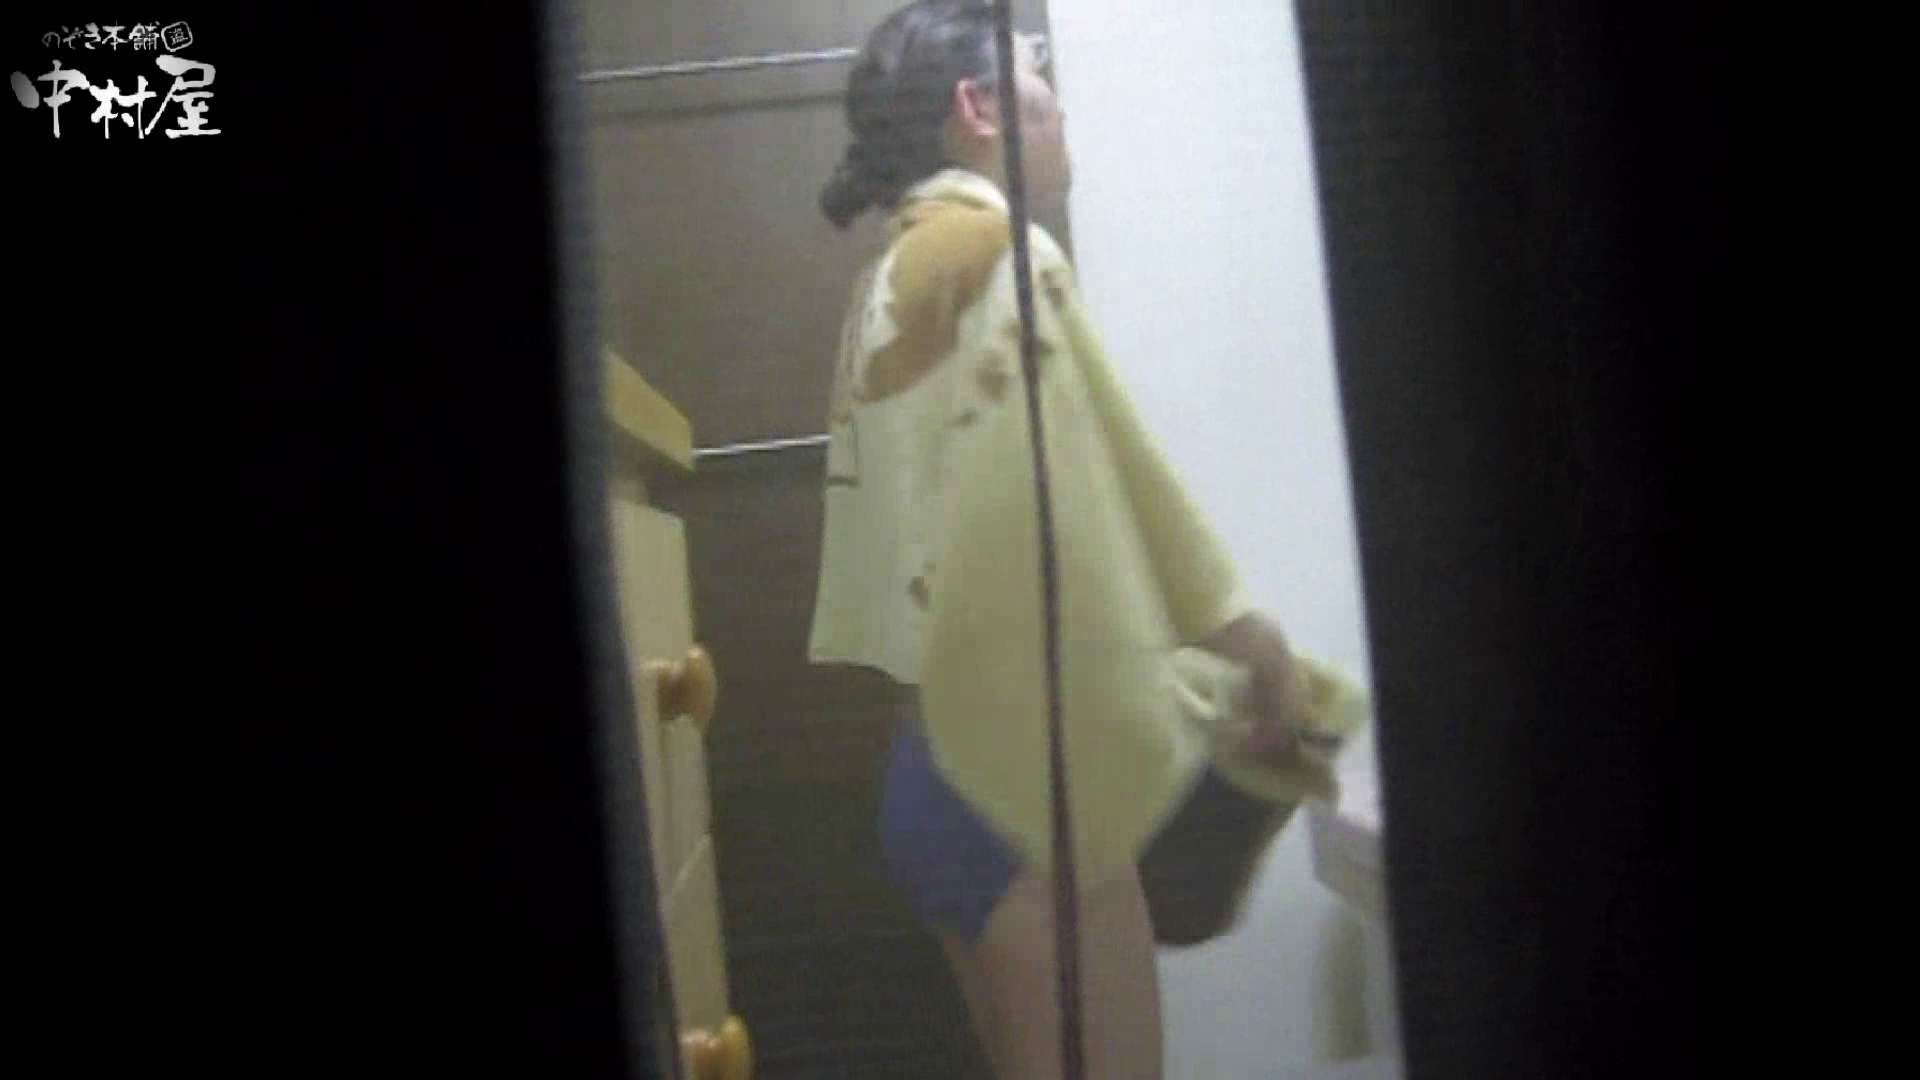 民家風呂専門盗撮師の超危険映像 vol.005 美少女のエロ生活  52連発 30